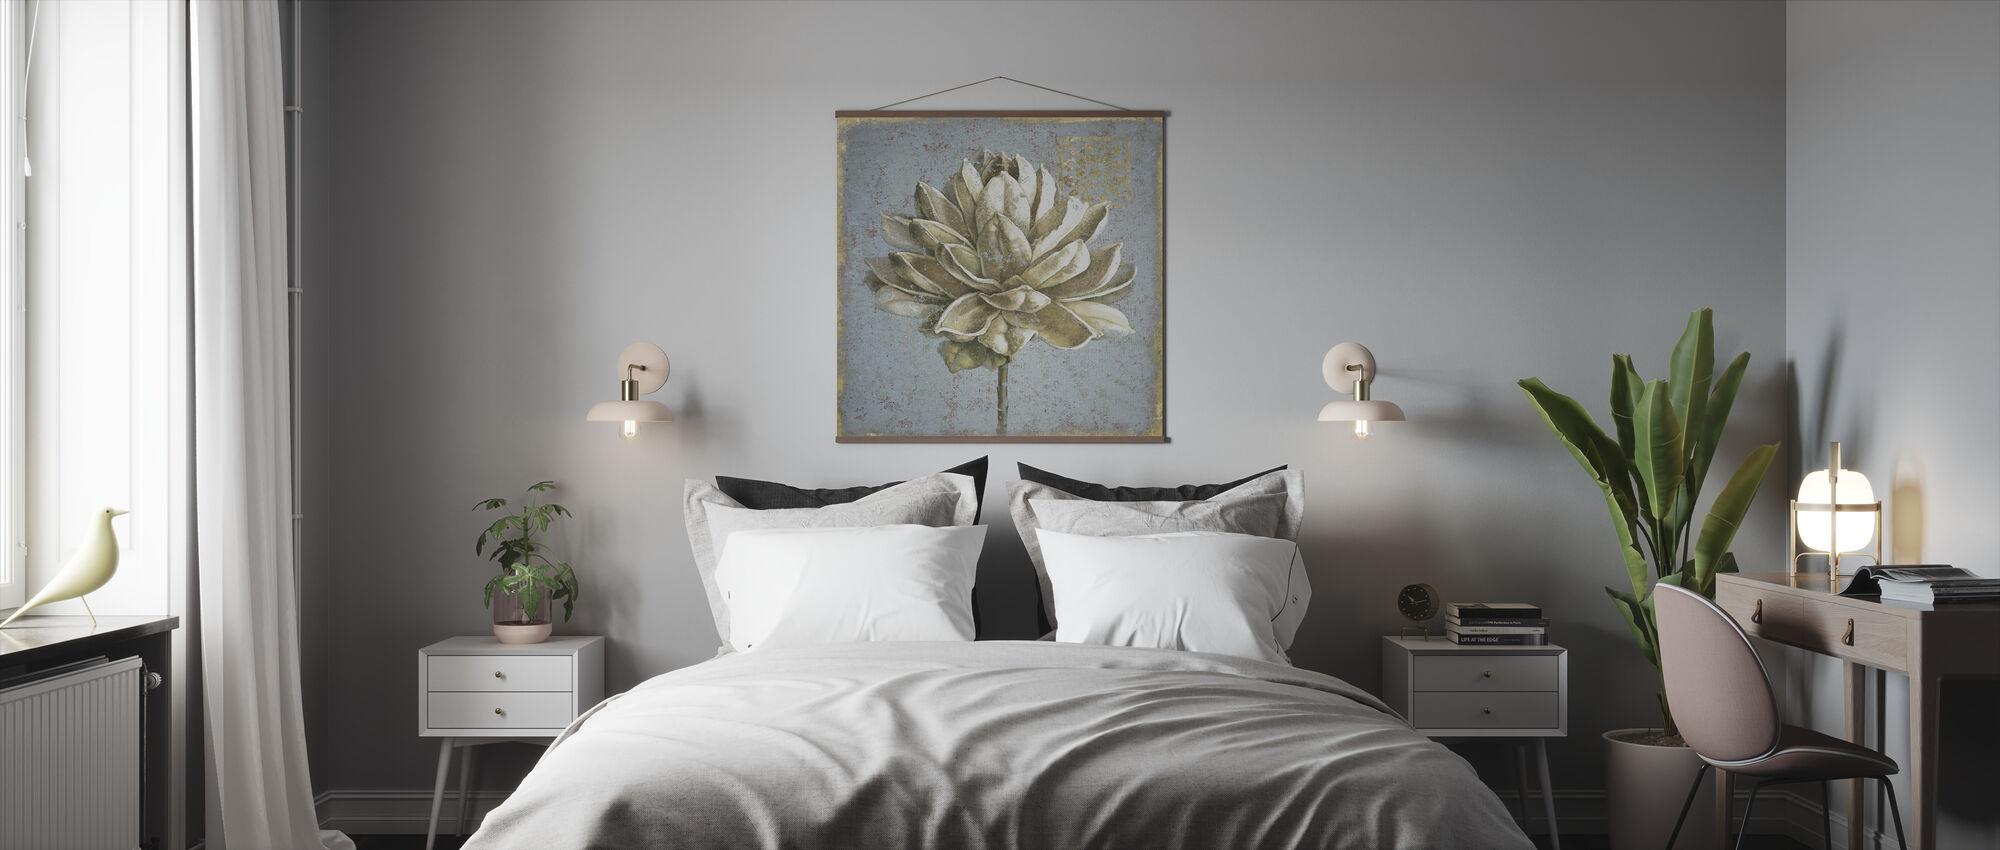 Seed Pod I - Poster - Bedroom